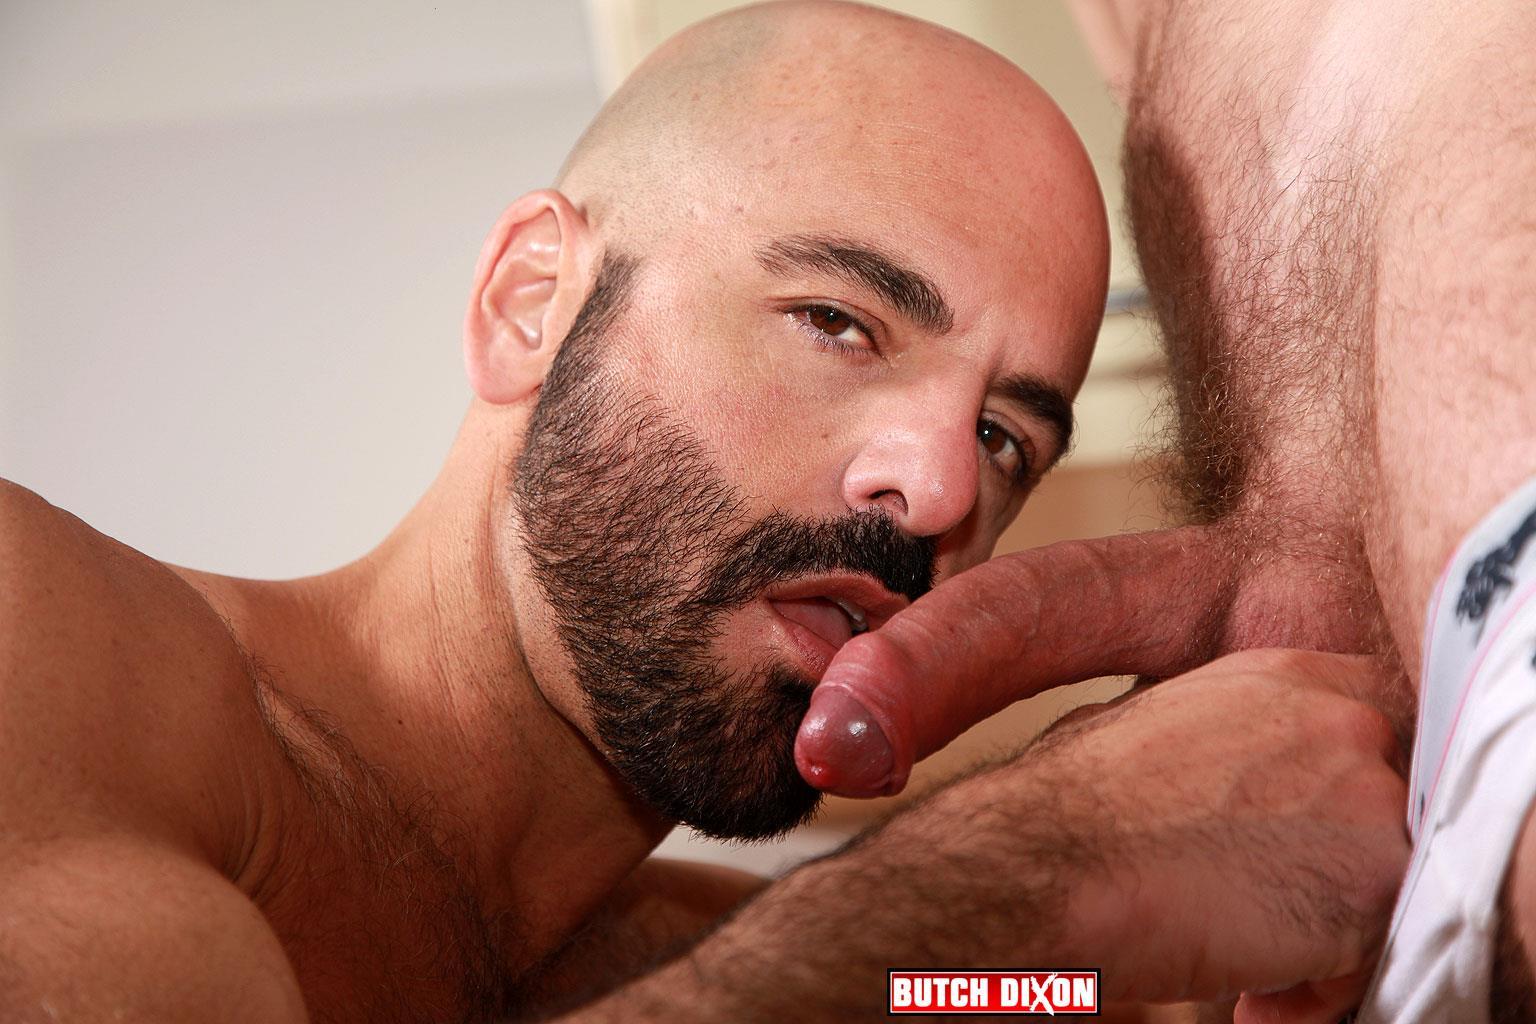 Butch-Dixon-Adam-Russo-and-Adam-Dacre-Getting-Fucked-By-A-Big-Uncut-Cock-Amateur-Gay-Porn-02 Adam Russo Getting A Big Bareback Uncut Cock Up His Hairy Ass